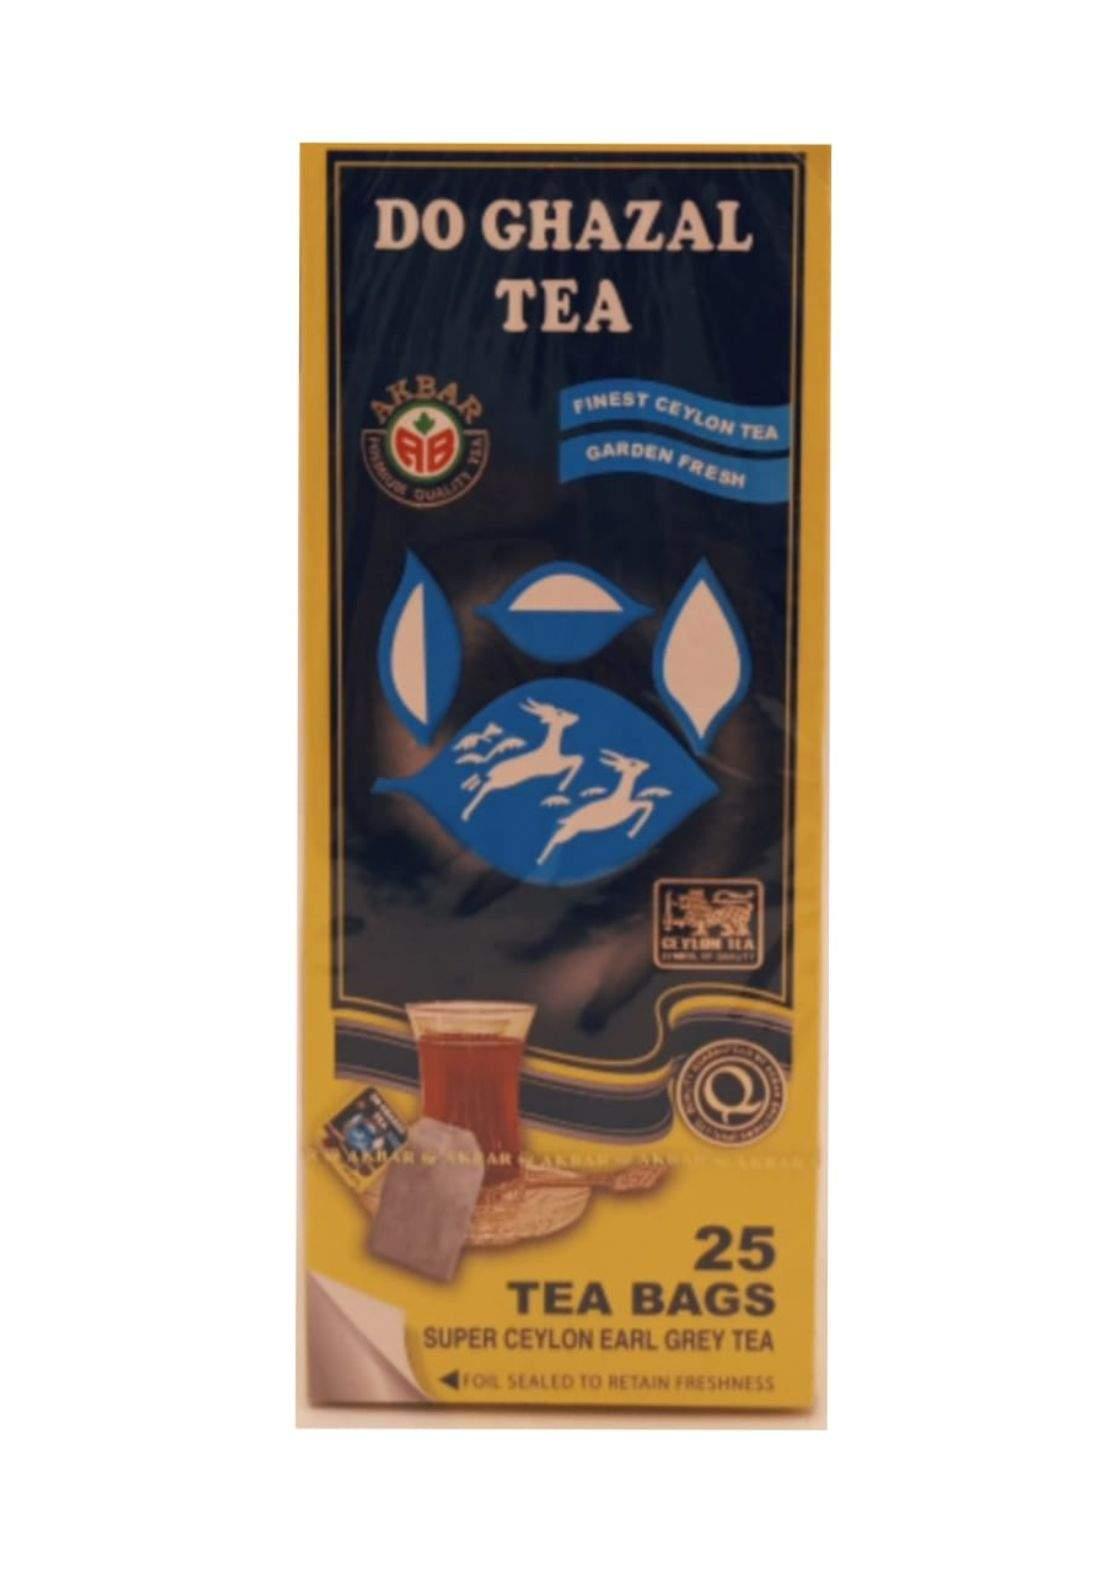 Do Ghazal Tea 25 tea bags شاي دو غزال 25 ظرف